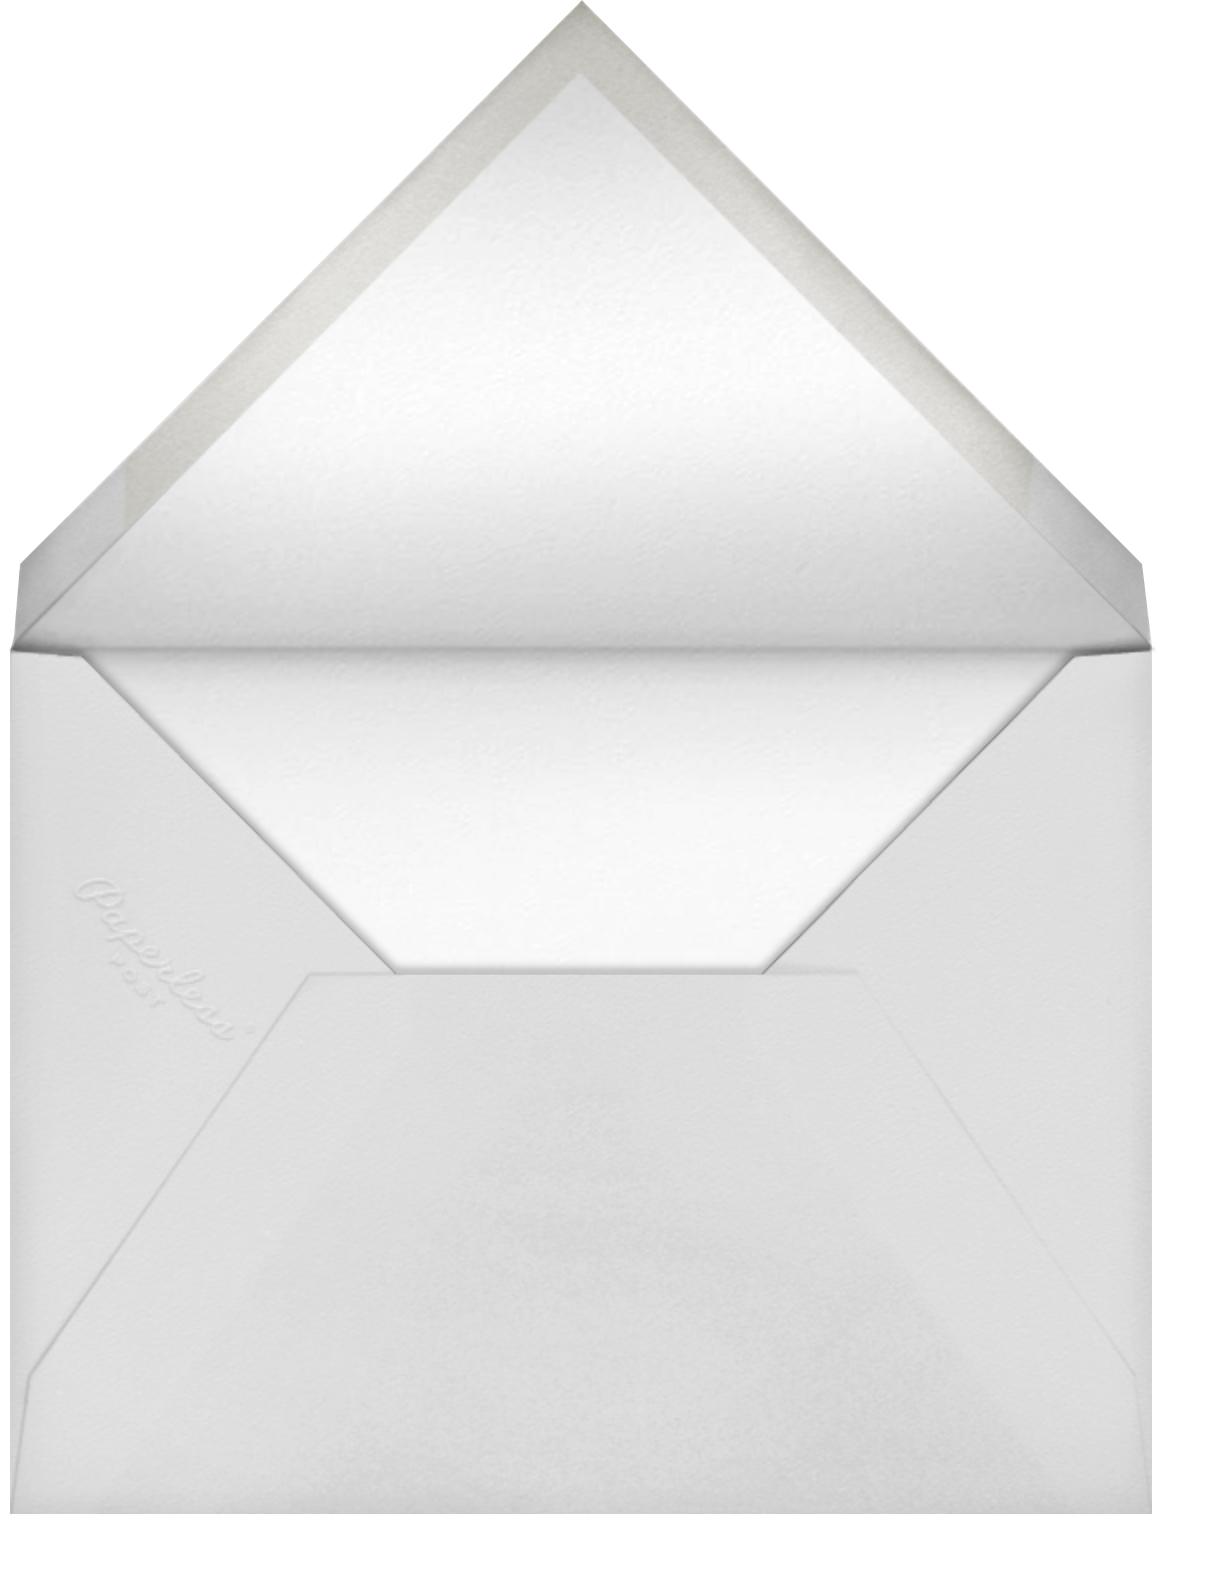 Kitty Hawk Greetings - Ivory - Paperless Post - null - envelope back